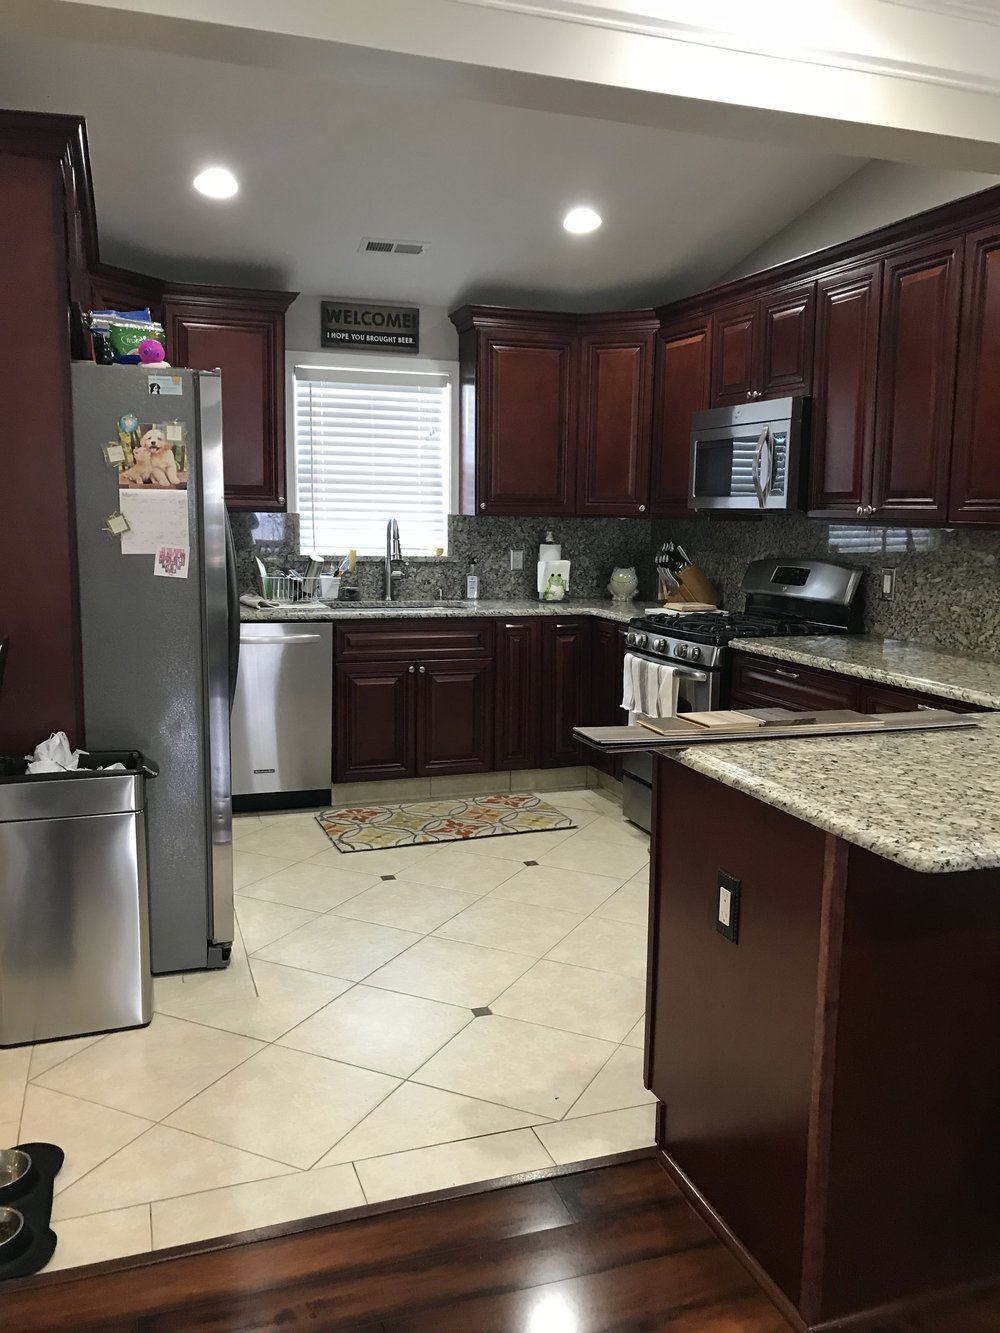 Dark flooring, dark cabinets